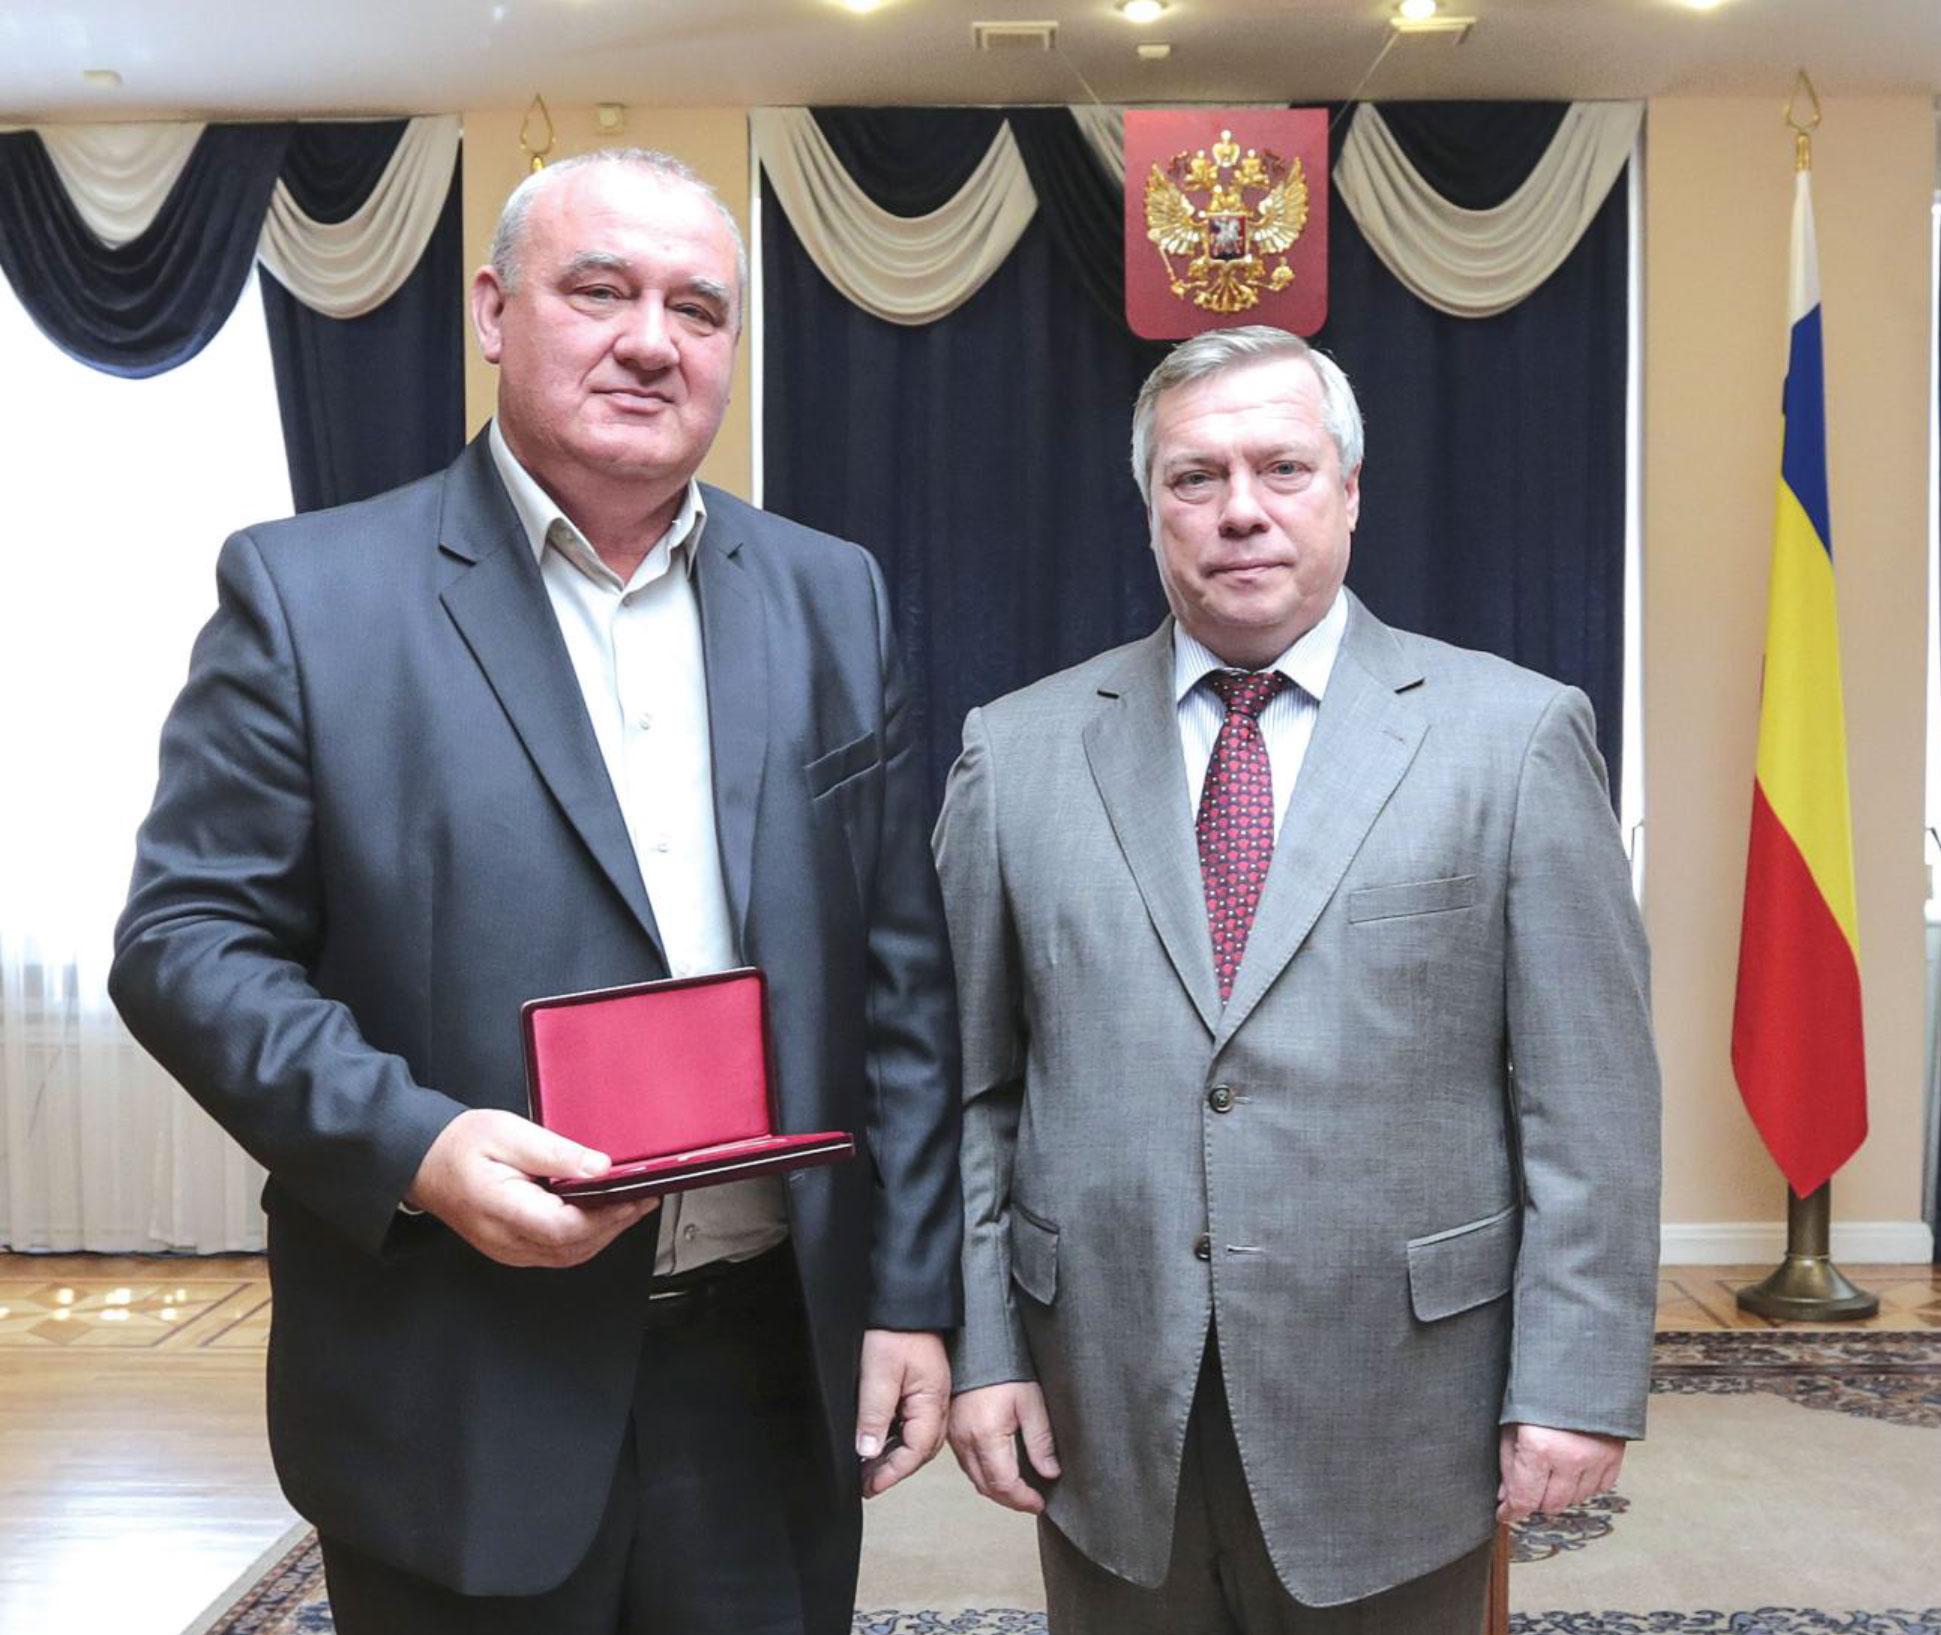 Голубев-и-Ген-директор-ГК-Светлый-Гончаров-Александр-Евгеньевич